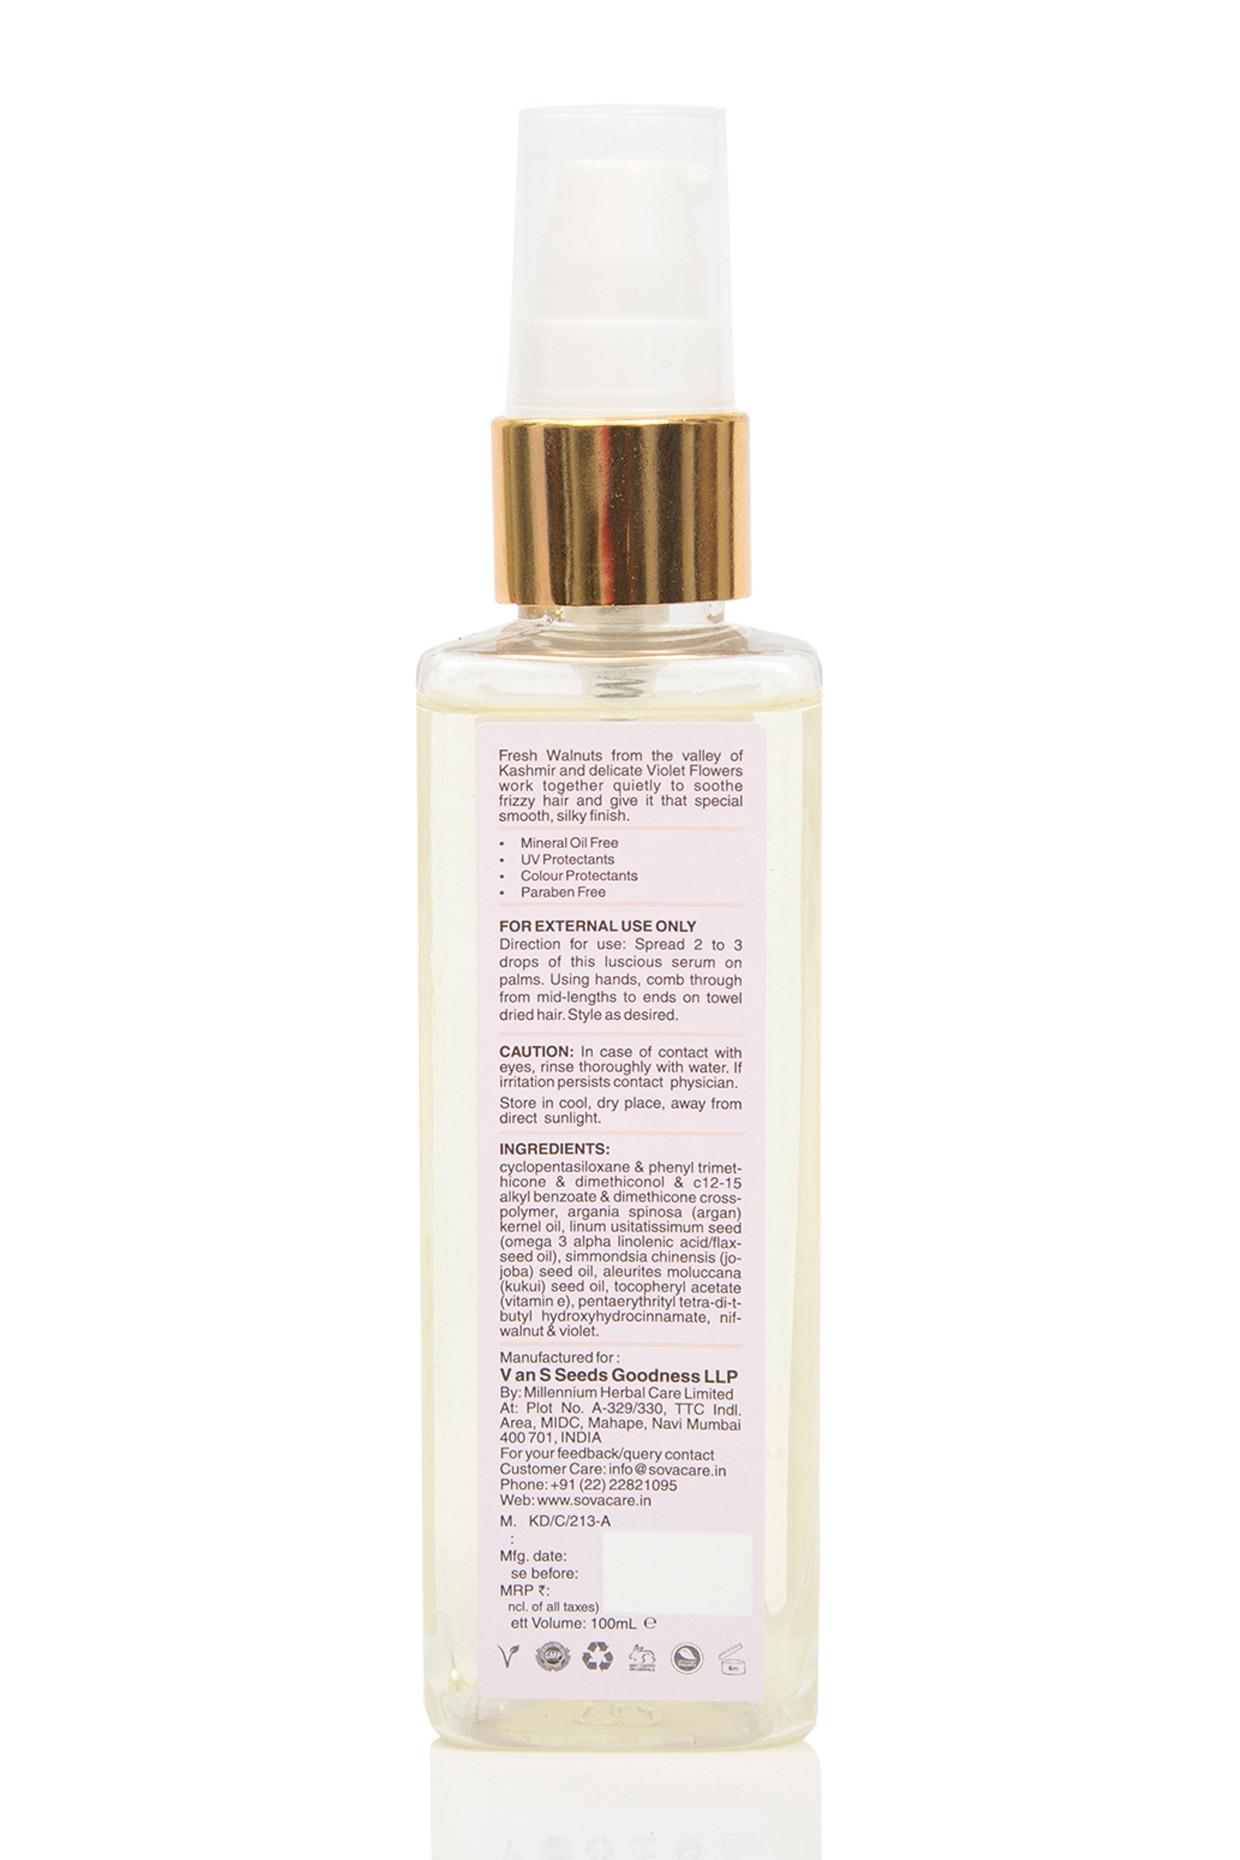 Violet Flower & Kashmiri Walnut Anti Frizz Hair Serum For All Hair Types by SOVA